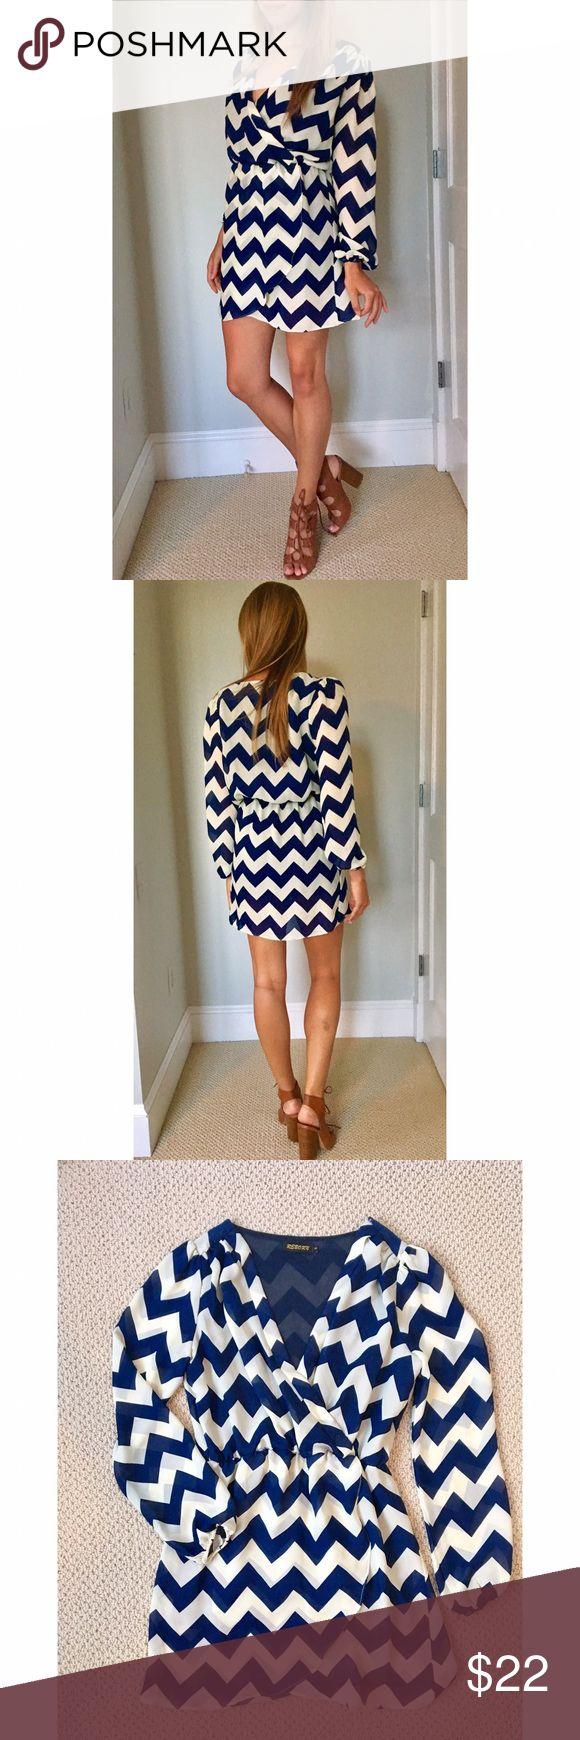 Chevron Long-sleeve Dress Navy and white nautical chevron chiffon lined long sleeve dress. Worn once Reborn Dresses Mini